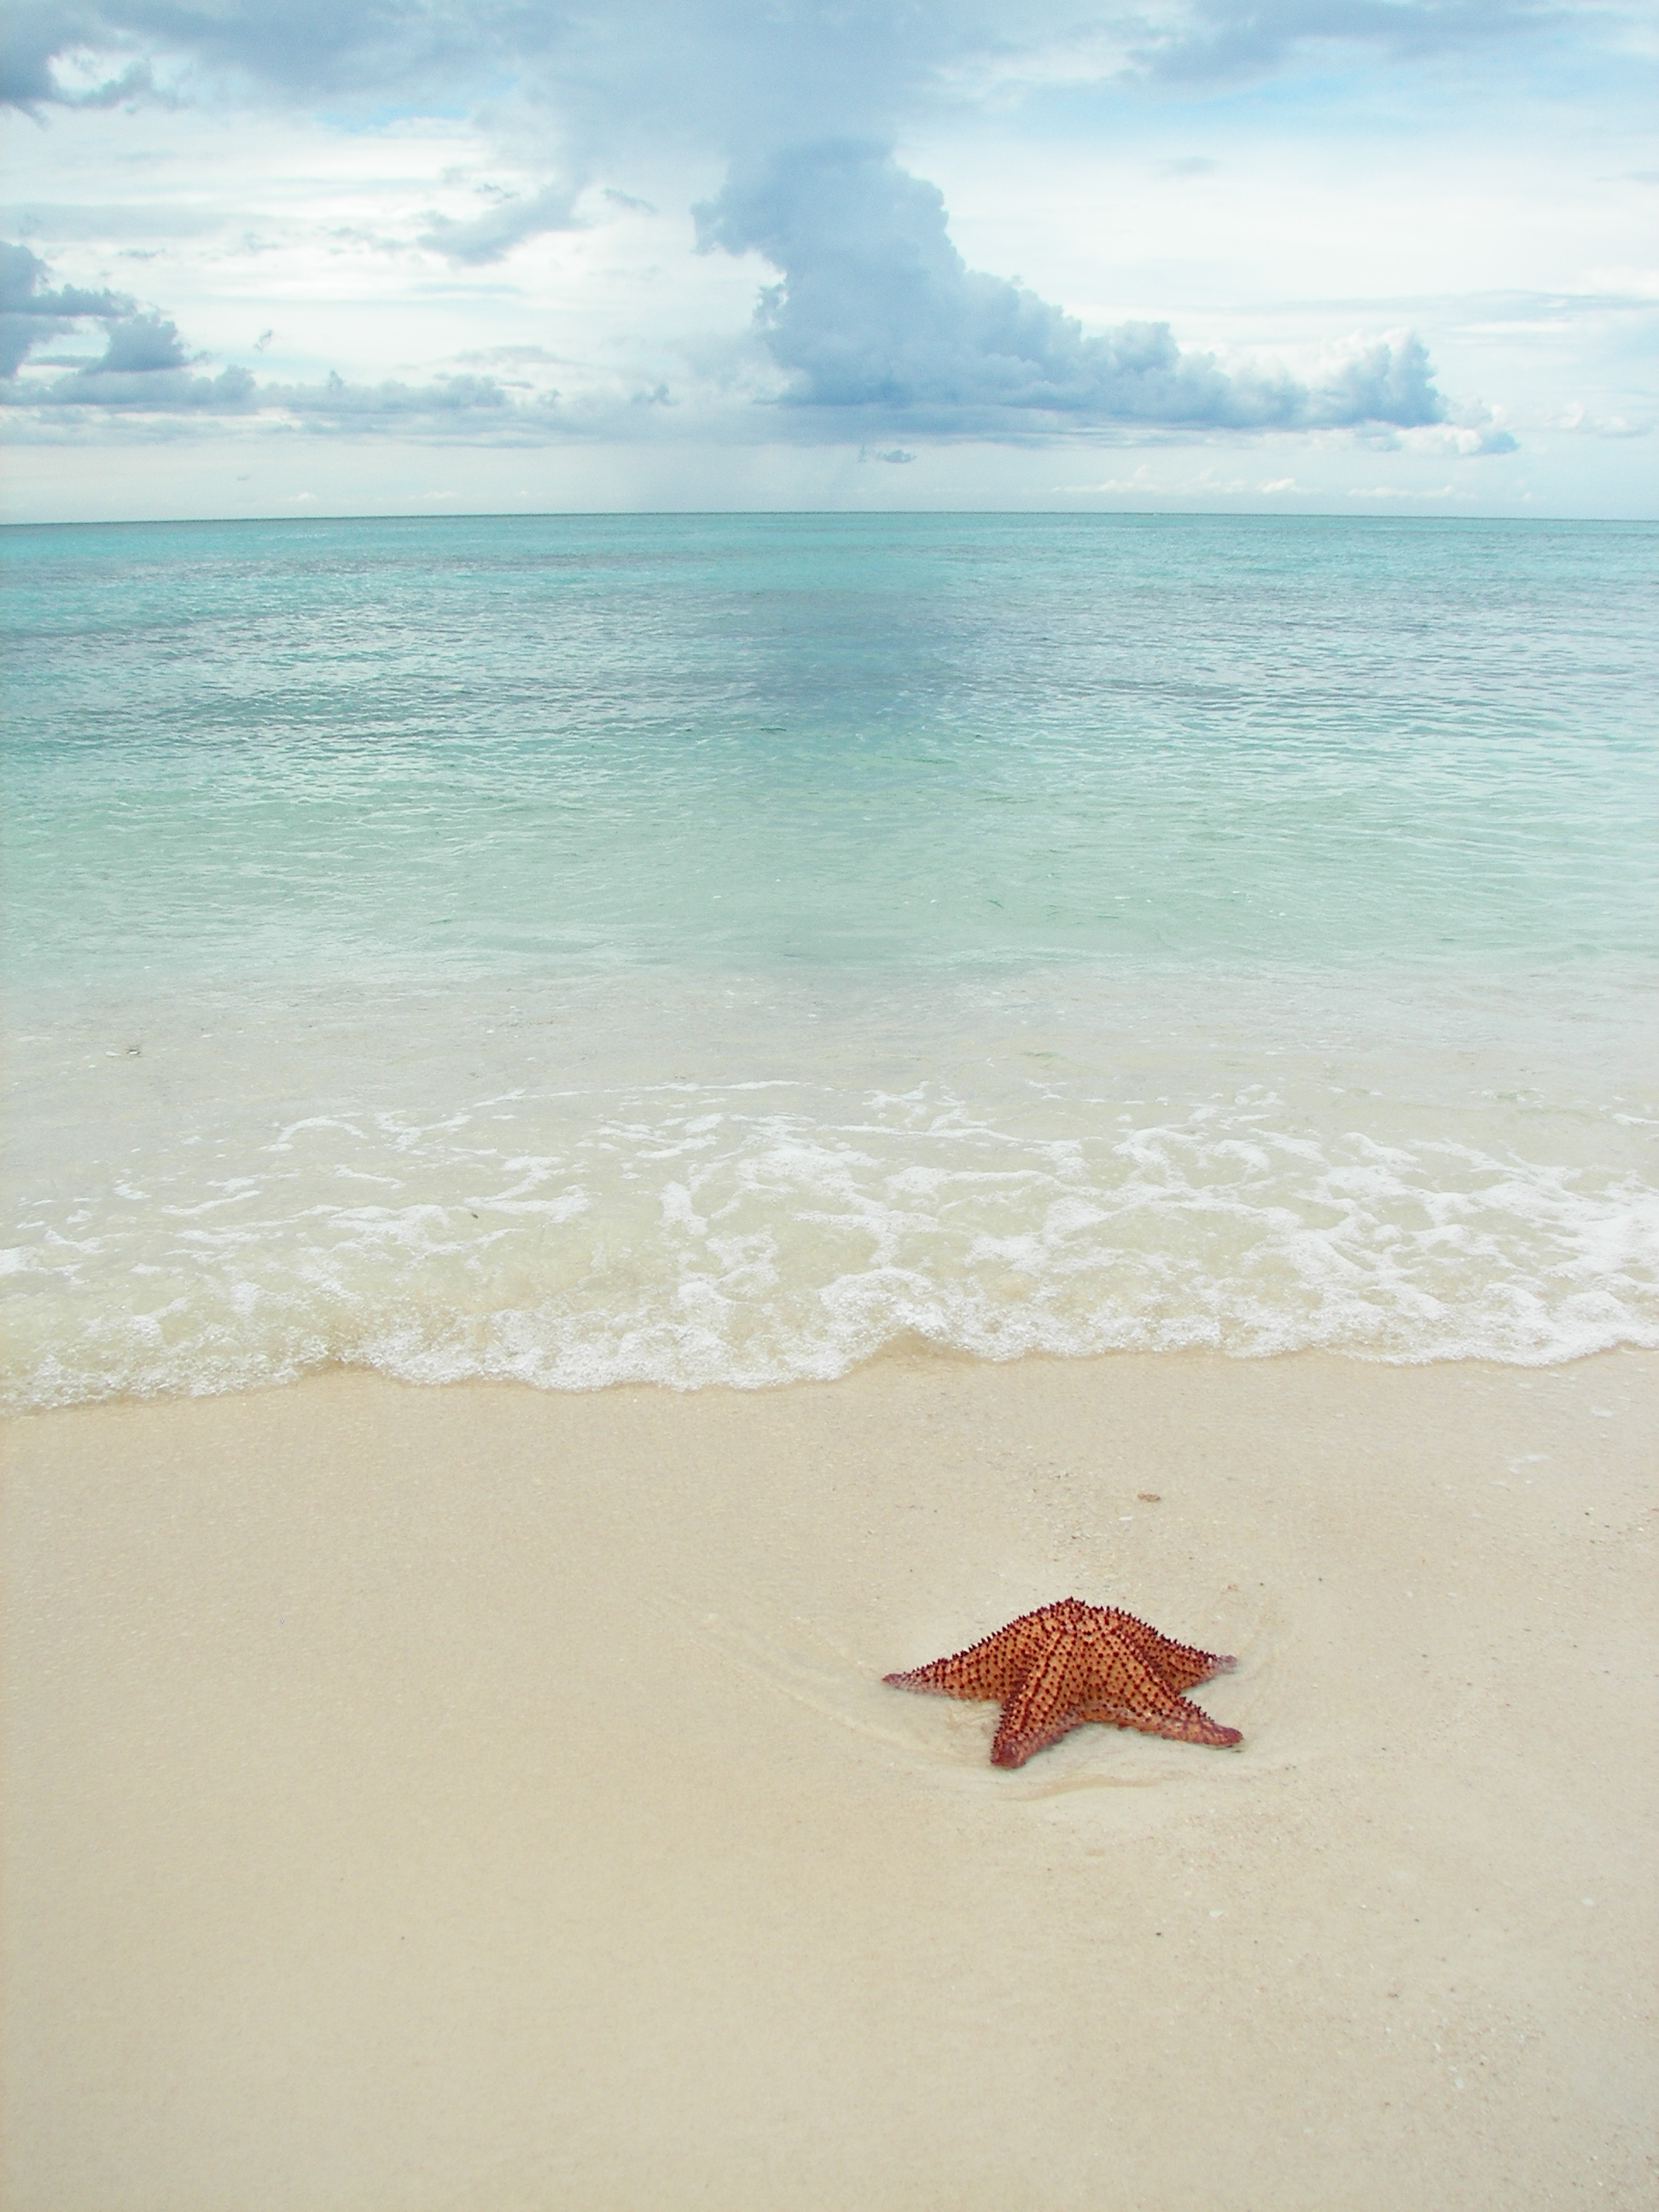 Sea Star - 2 by photohouse